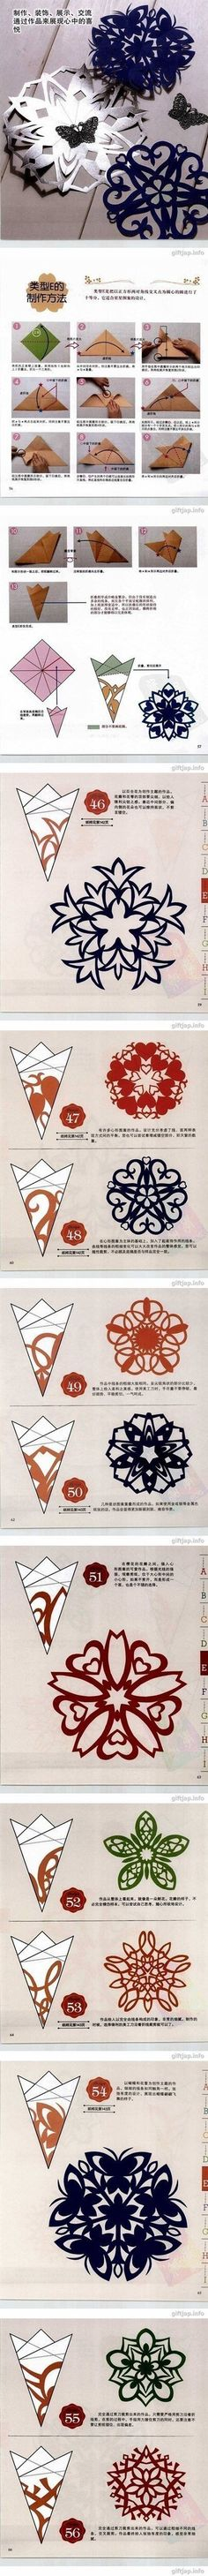 DIY Chinese Paper Cutting